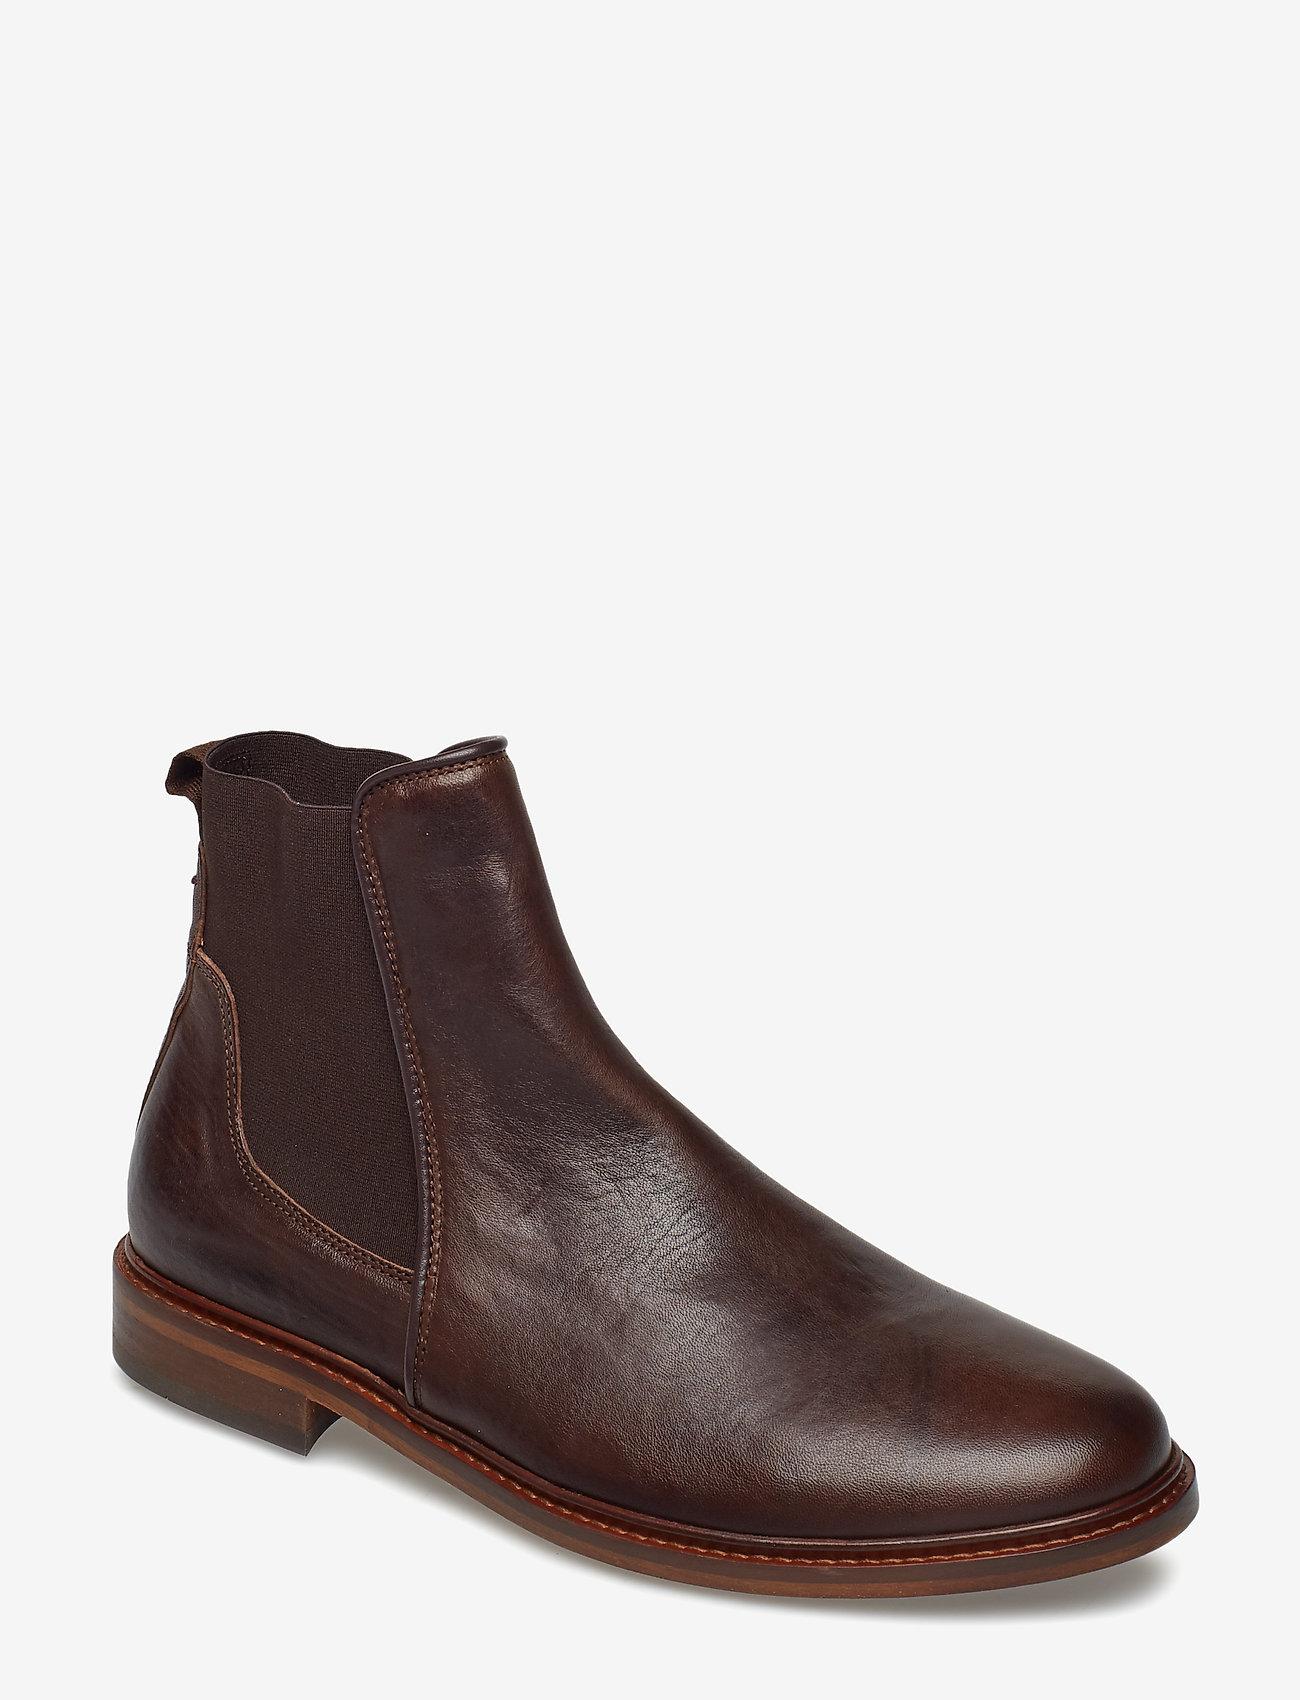 Stb-wyatt L (Brown) (95.97 €) - Shoe The Bear rwvRg